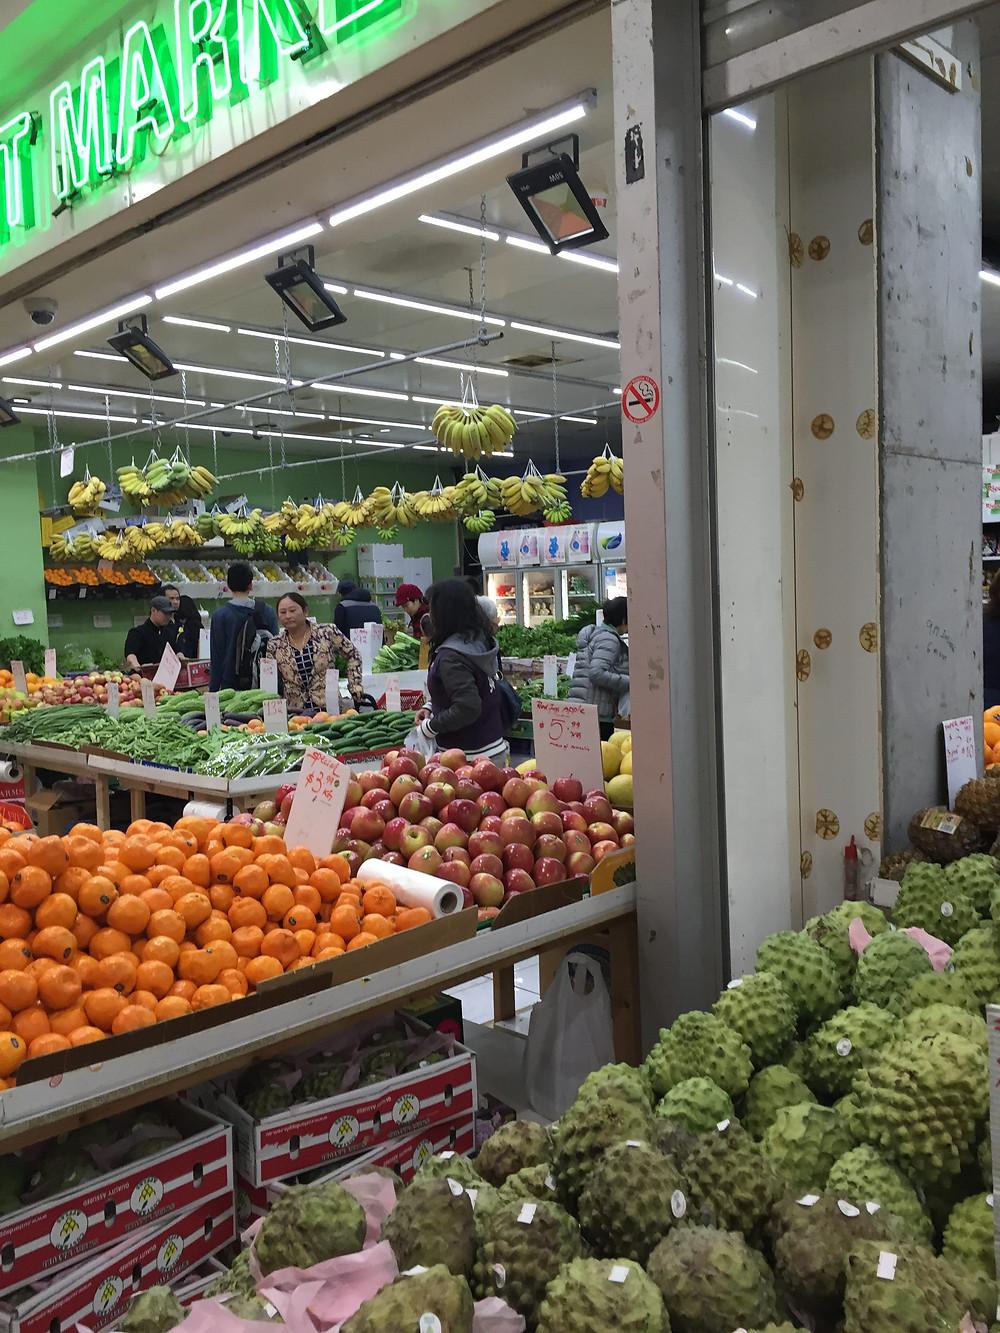 Cabramatta Fruit Market